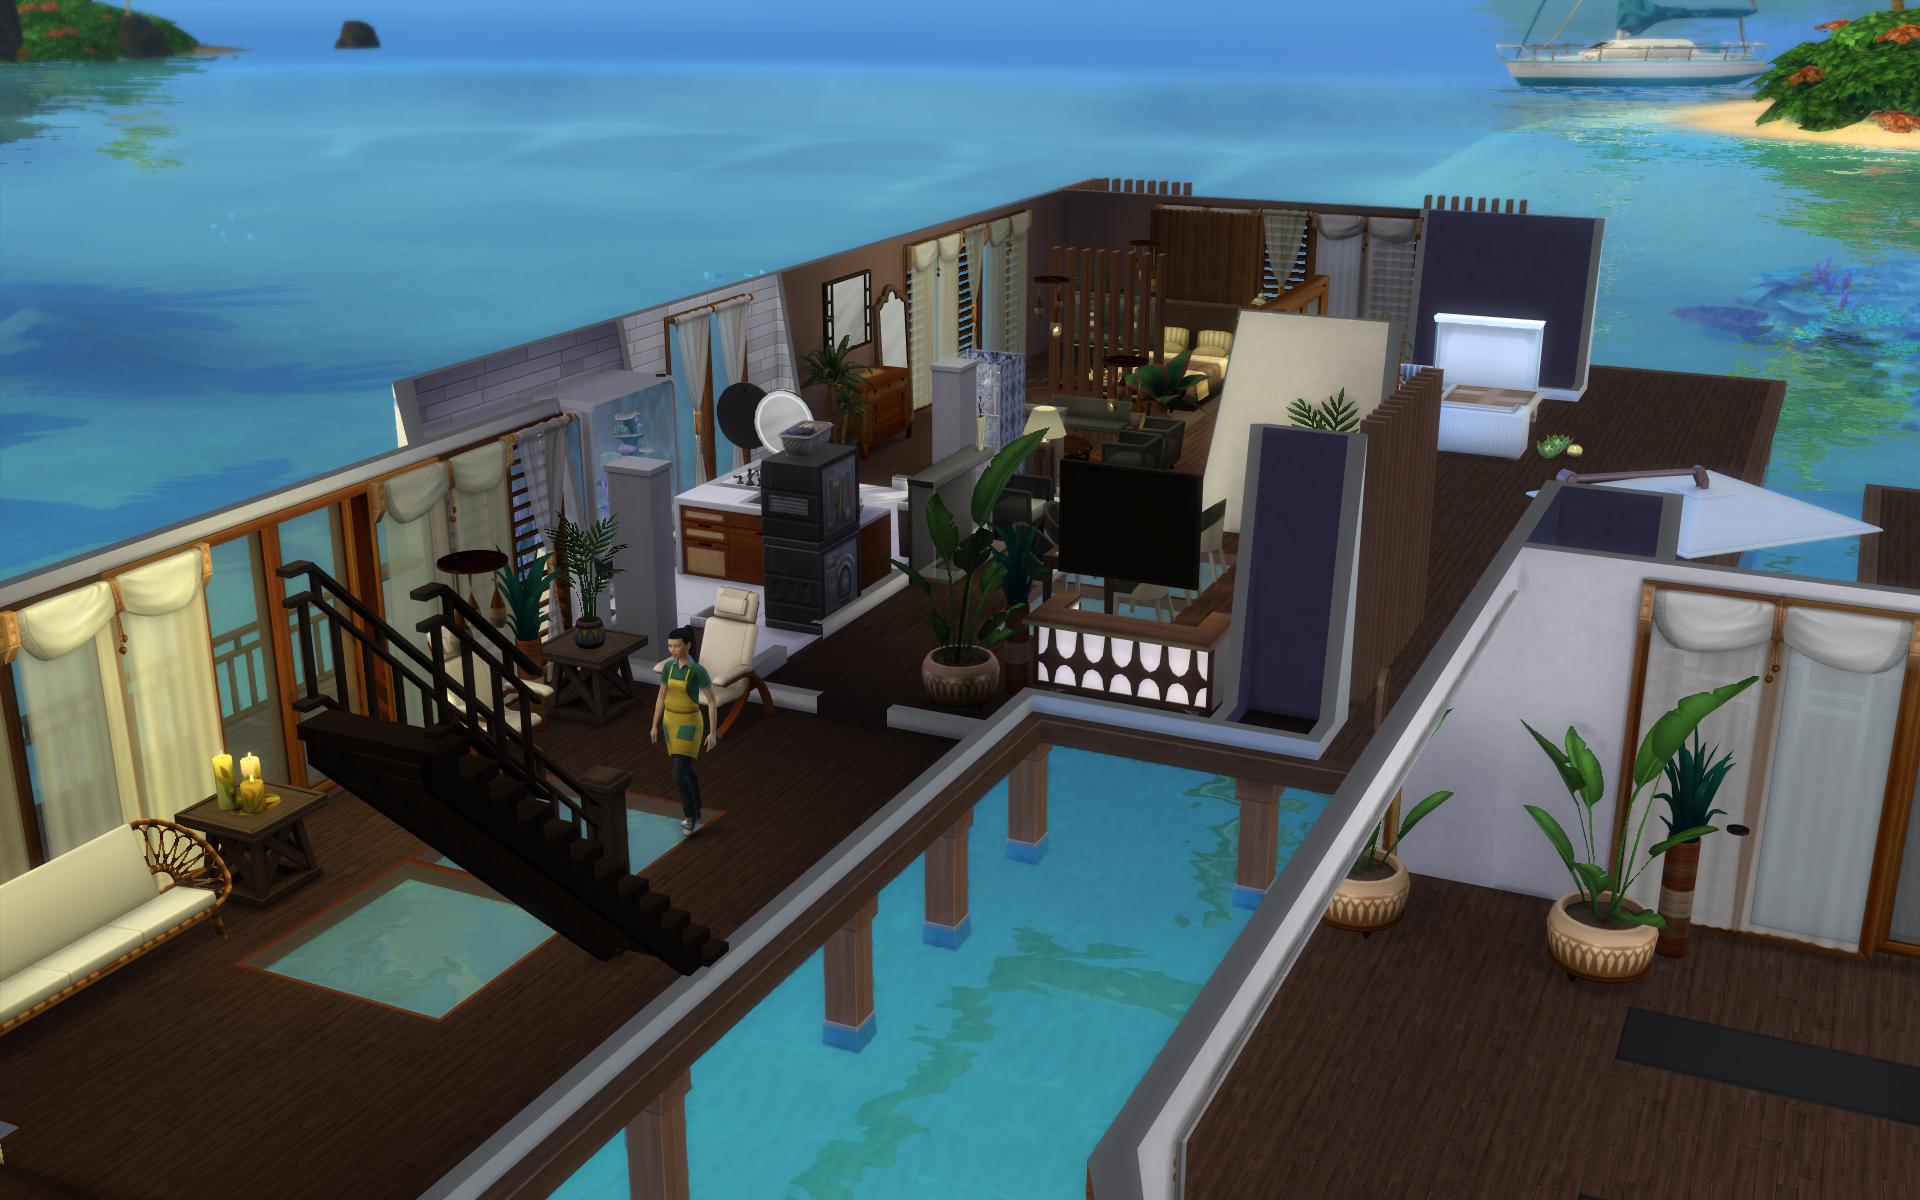 NPC's wandering through sims house